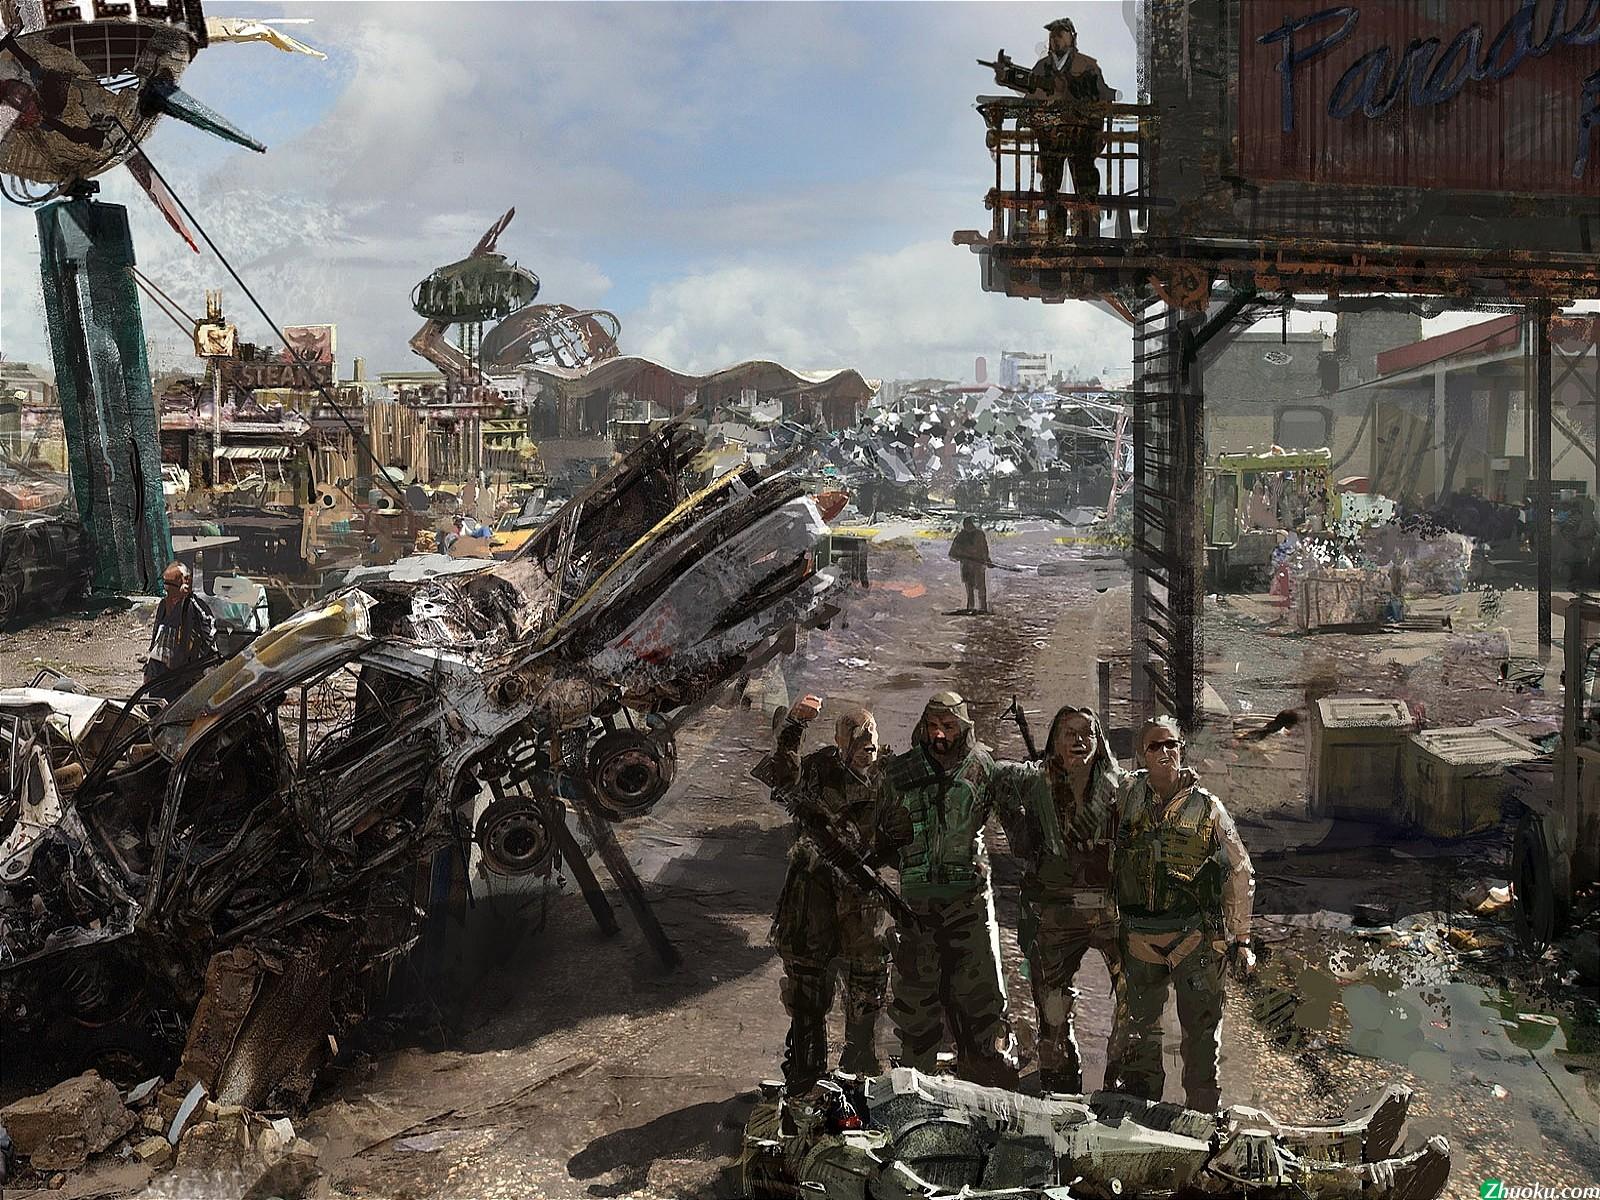 Fallout Concept Wallpaper 1600x1200 Fallout Concept Art 1600x1200